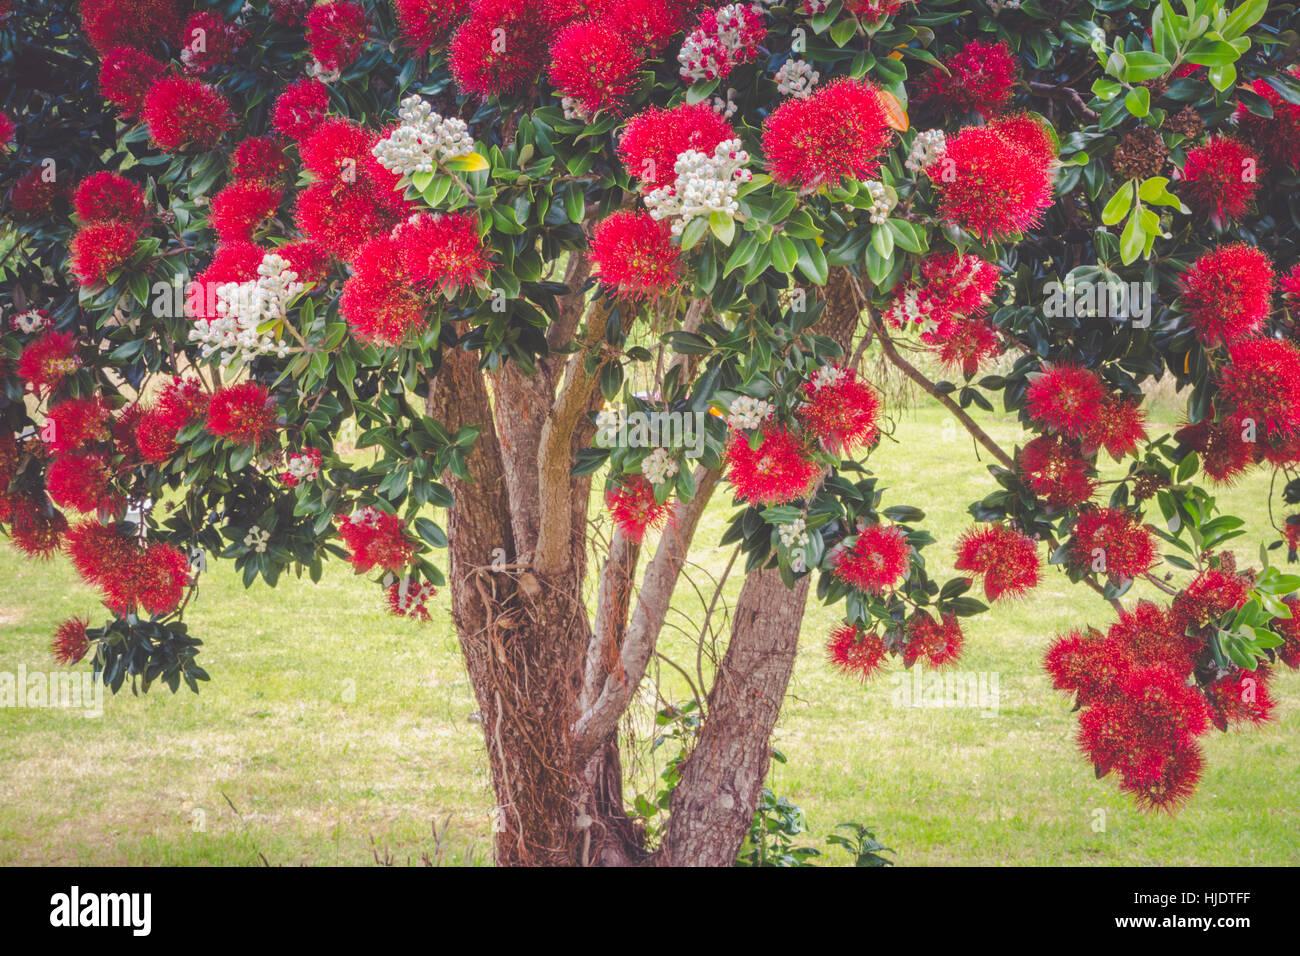 pohutukawa tree blooming in summer season in new zealand. pohutukawa